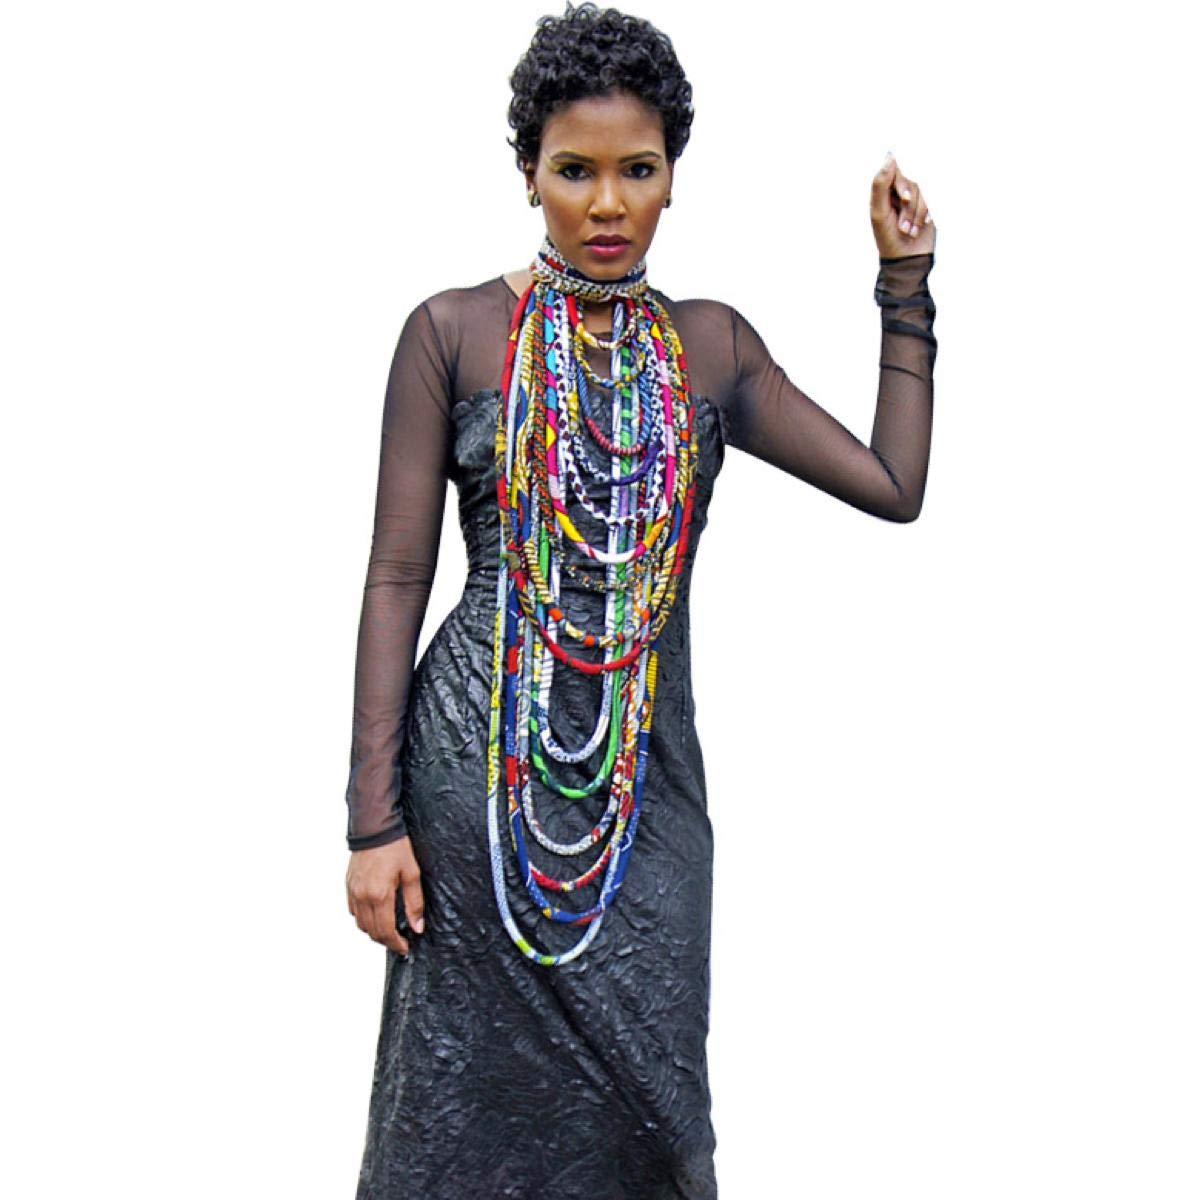 Colorful Handmade African Ankara Necklace Wax Print Dashiki Fabric Necklace Shawl by BintaRealWax (Image #1)